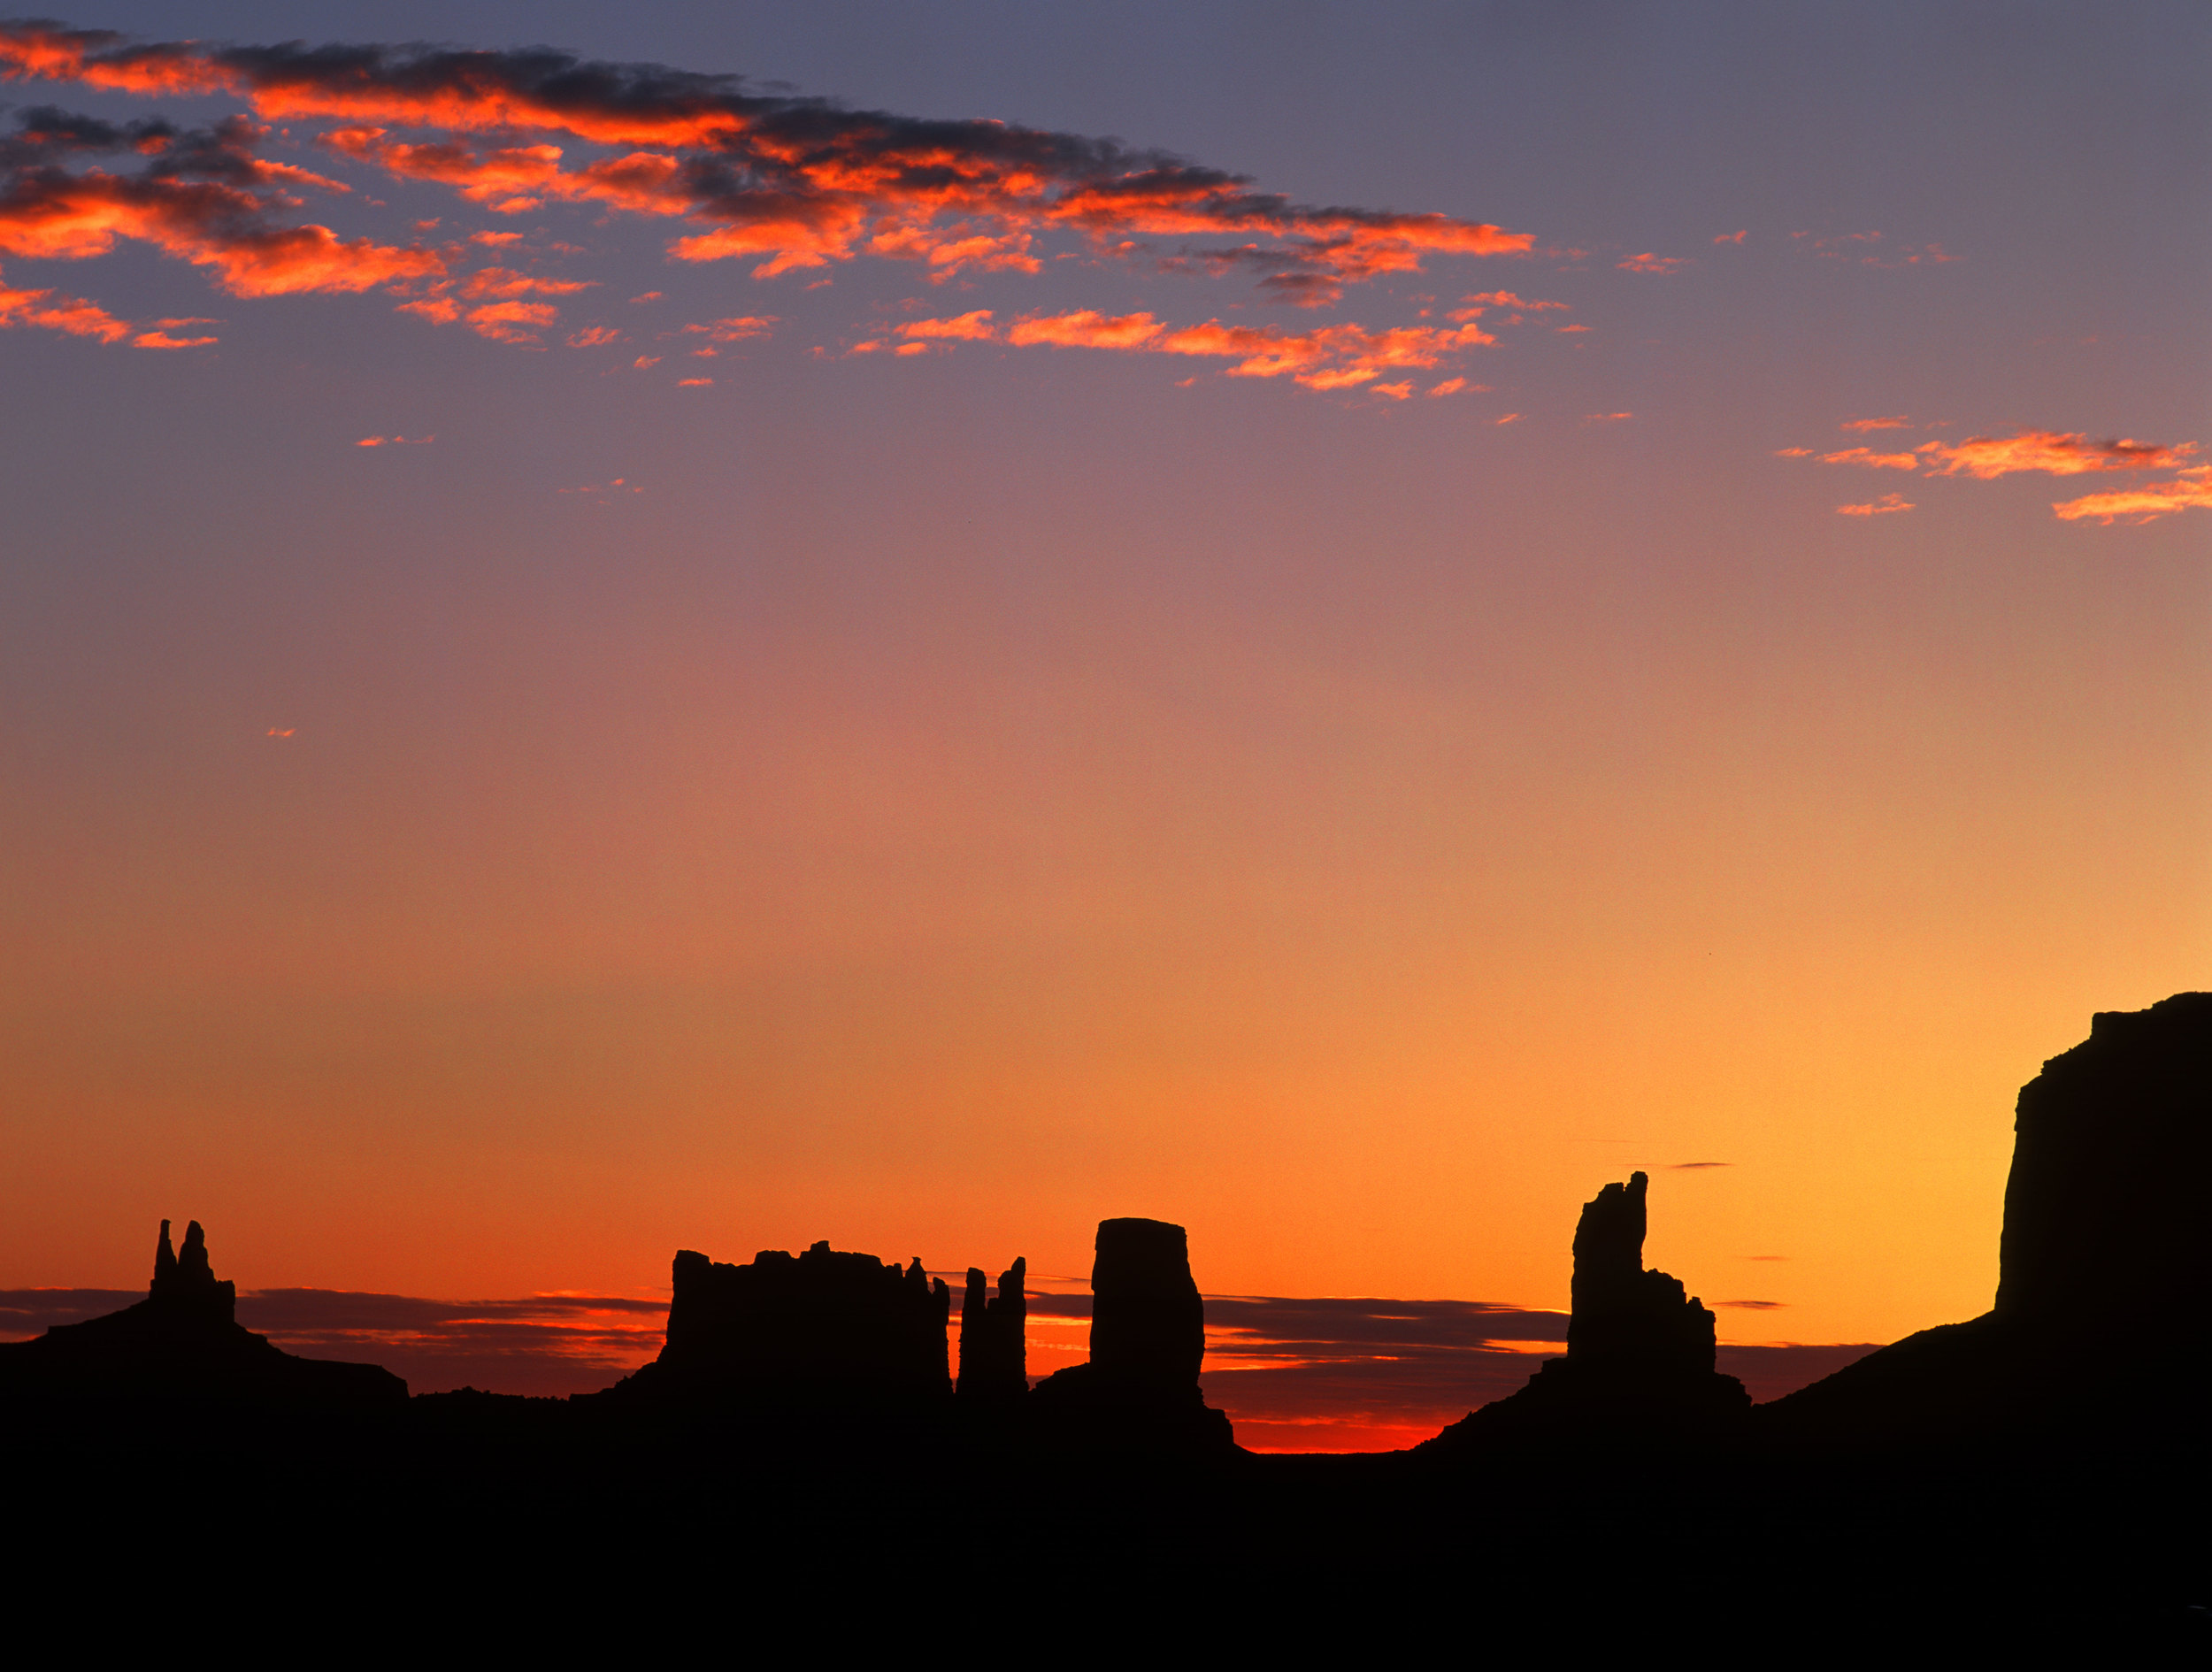 040514-Sunrise-at-Monument-Valley.jpg